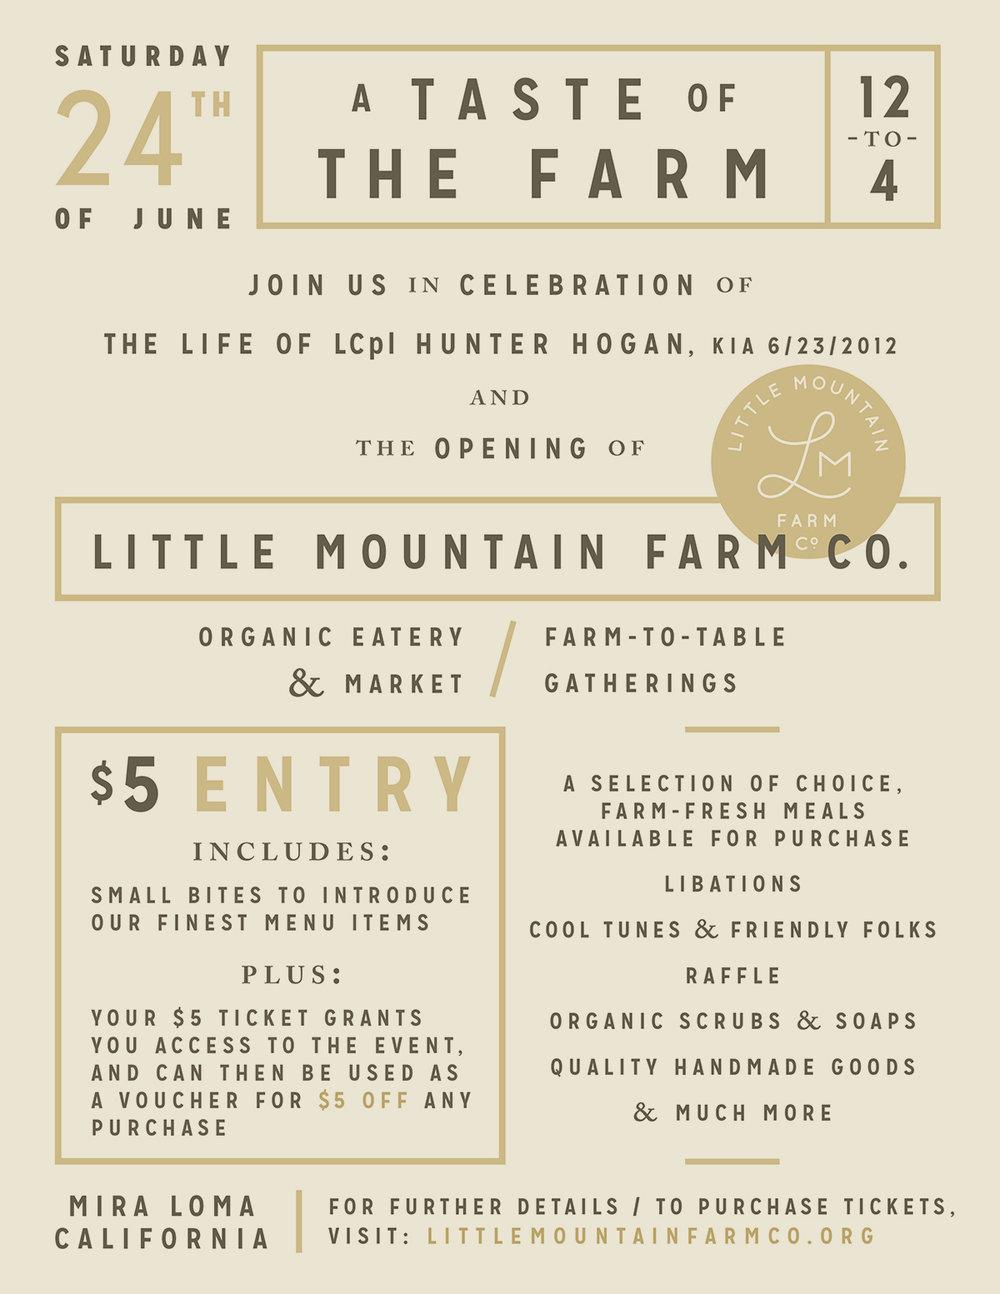 LMFC_A-Taste-of-the-Farm_8.5x11_v5 s.jpg